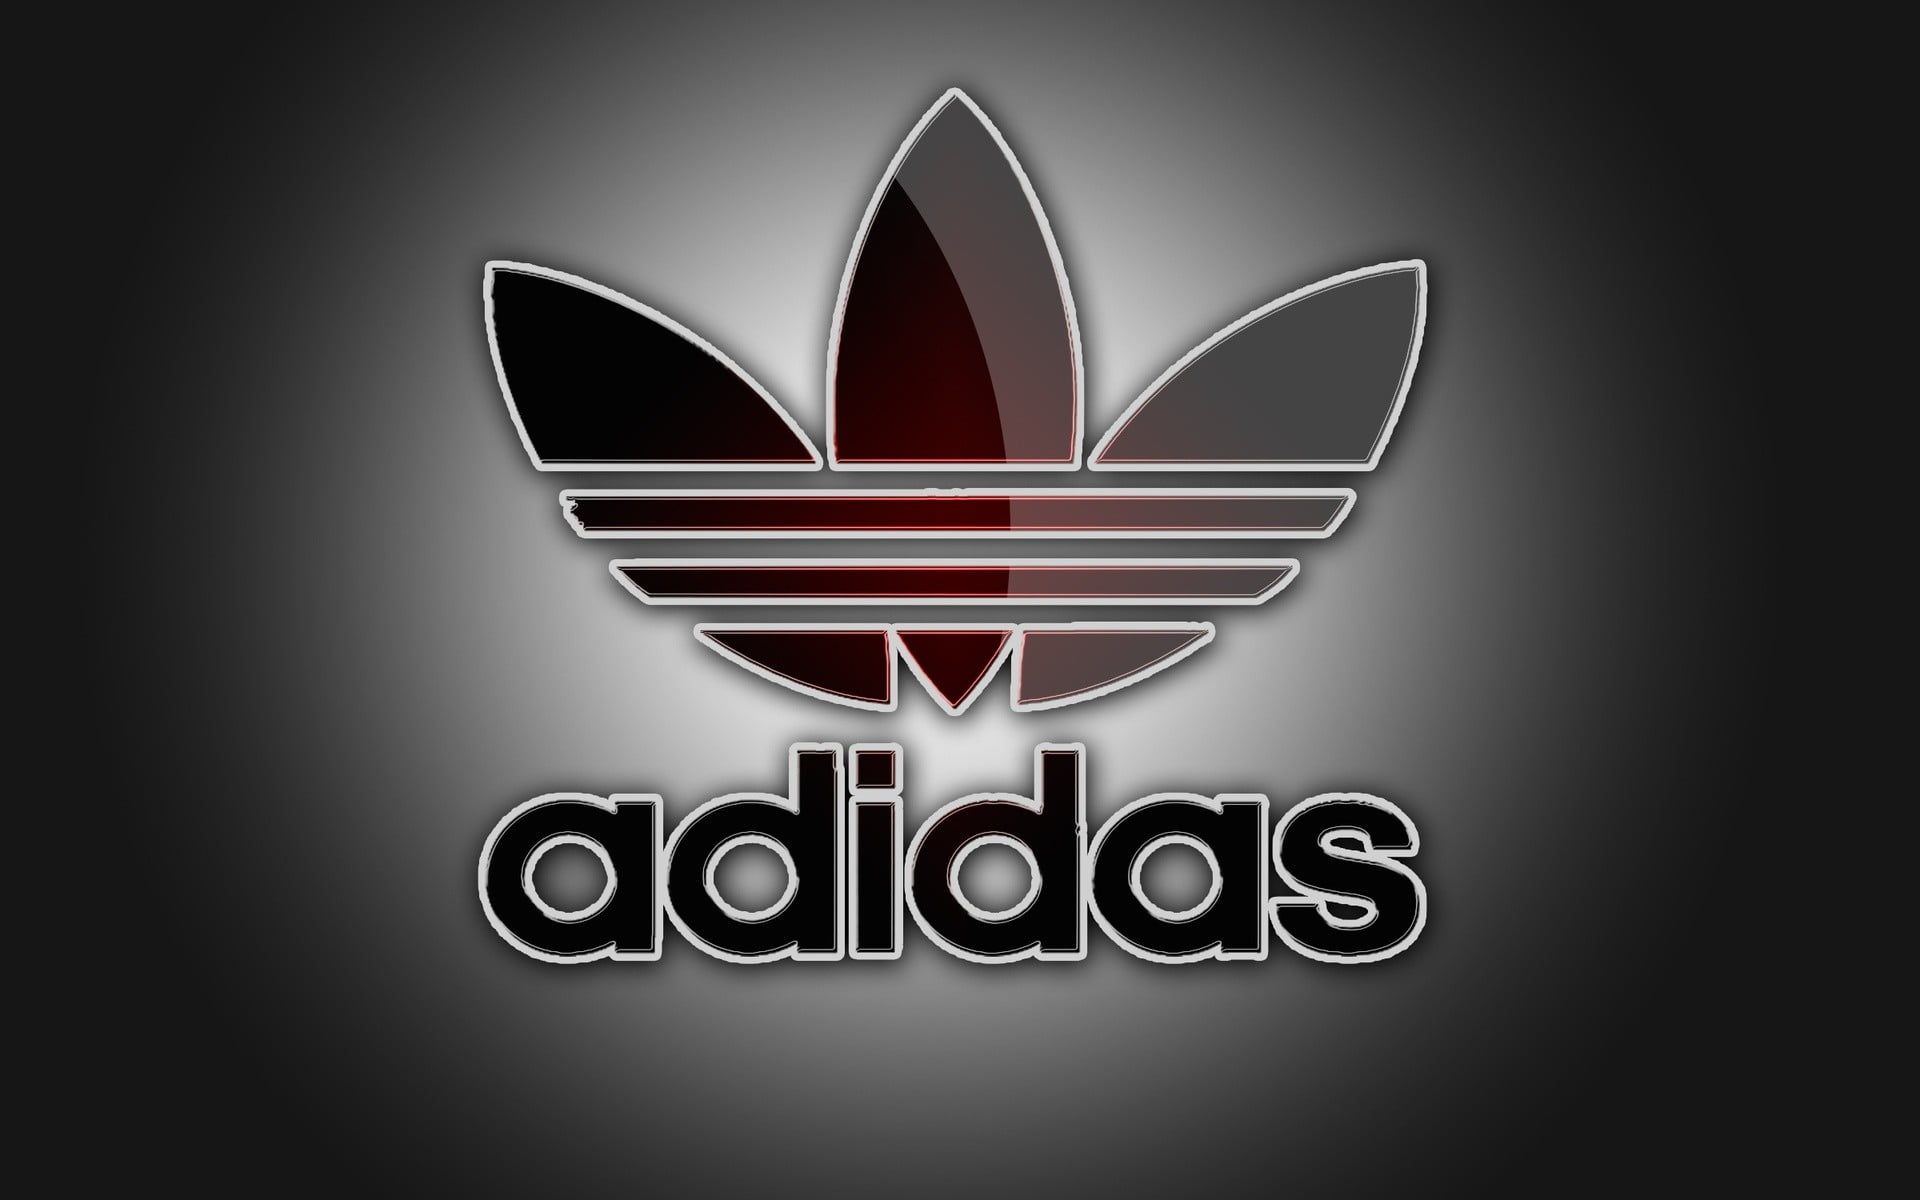 brand logo Adidas 1080P wallpaper hdwallpaper